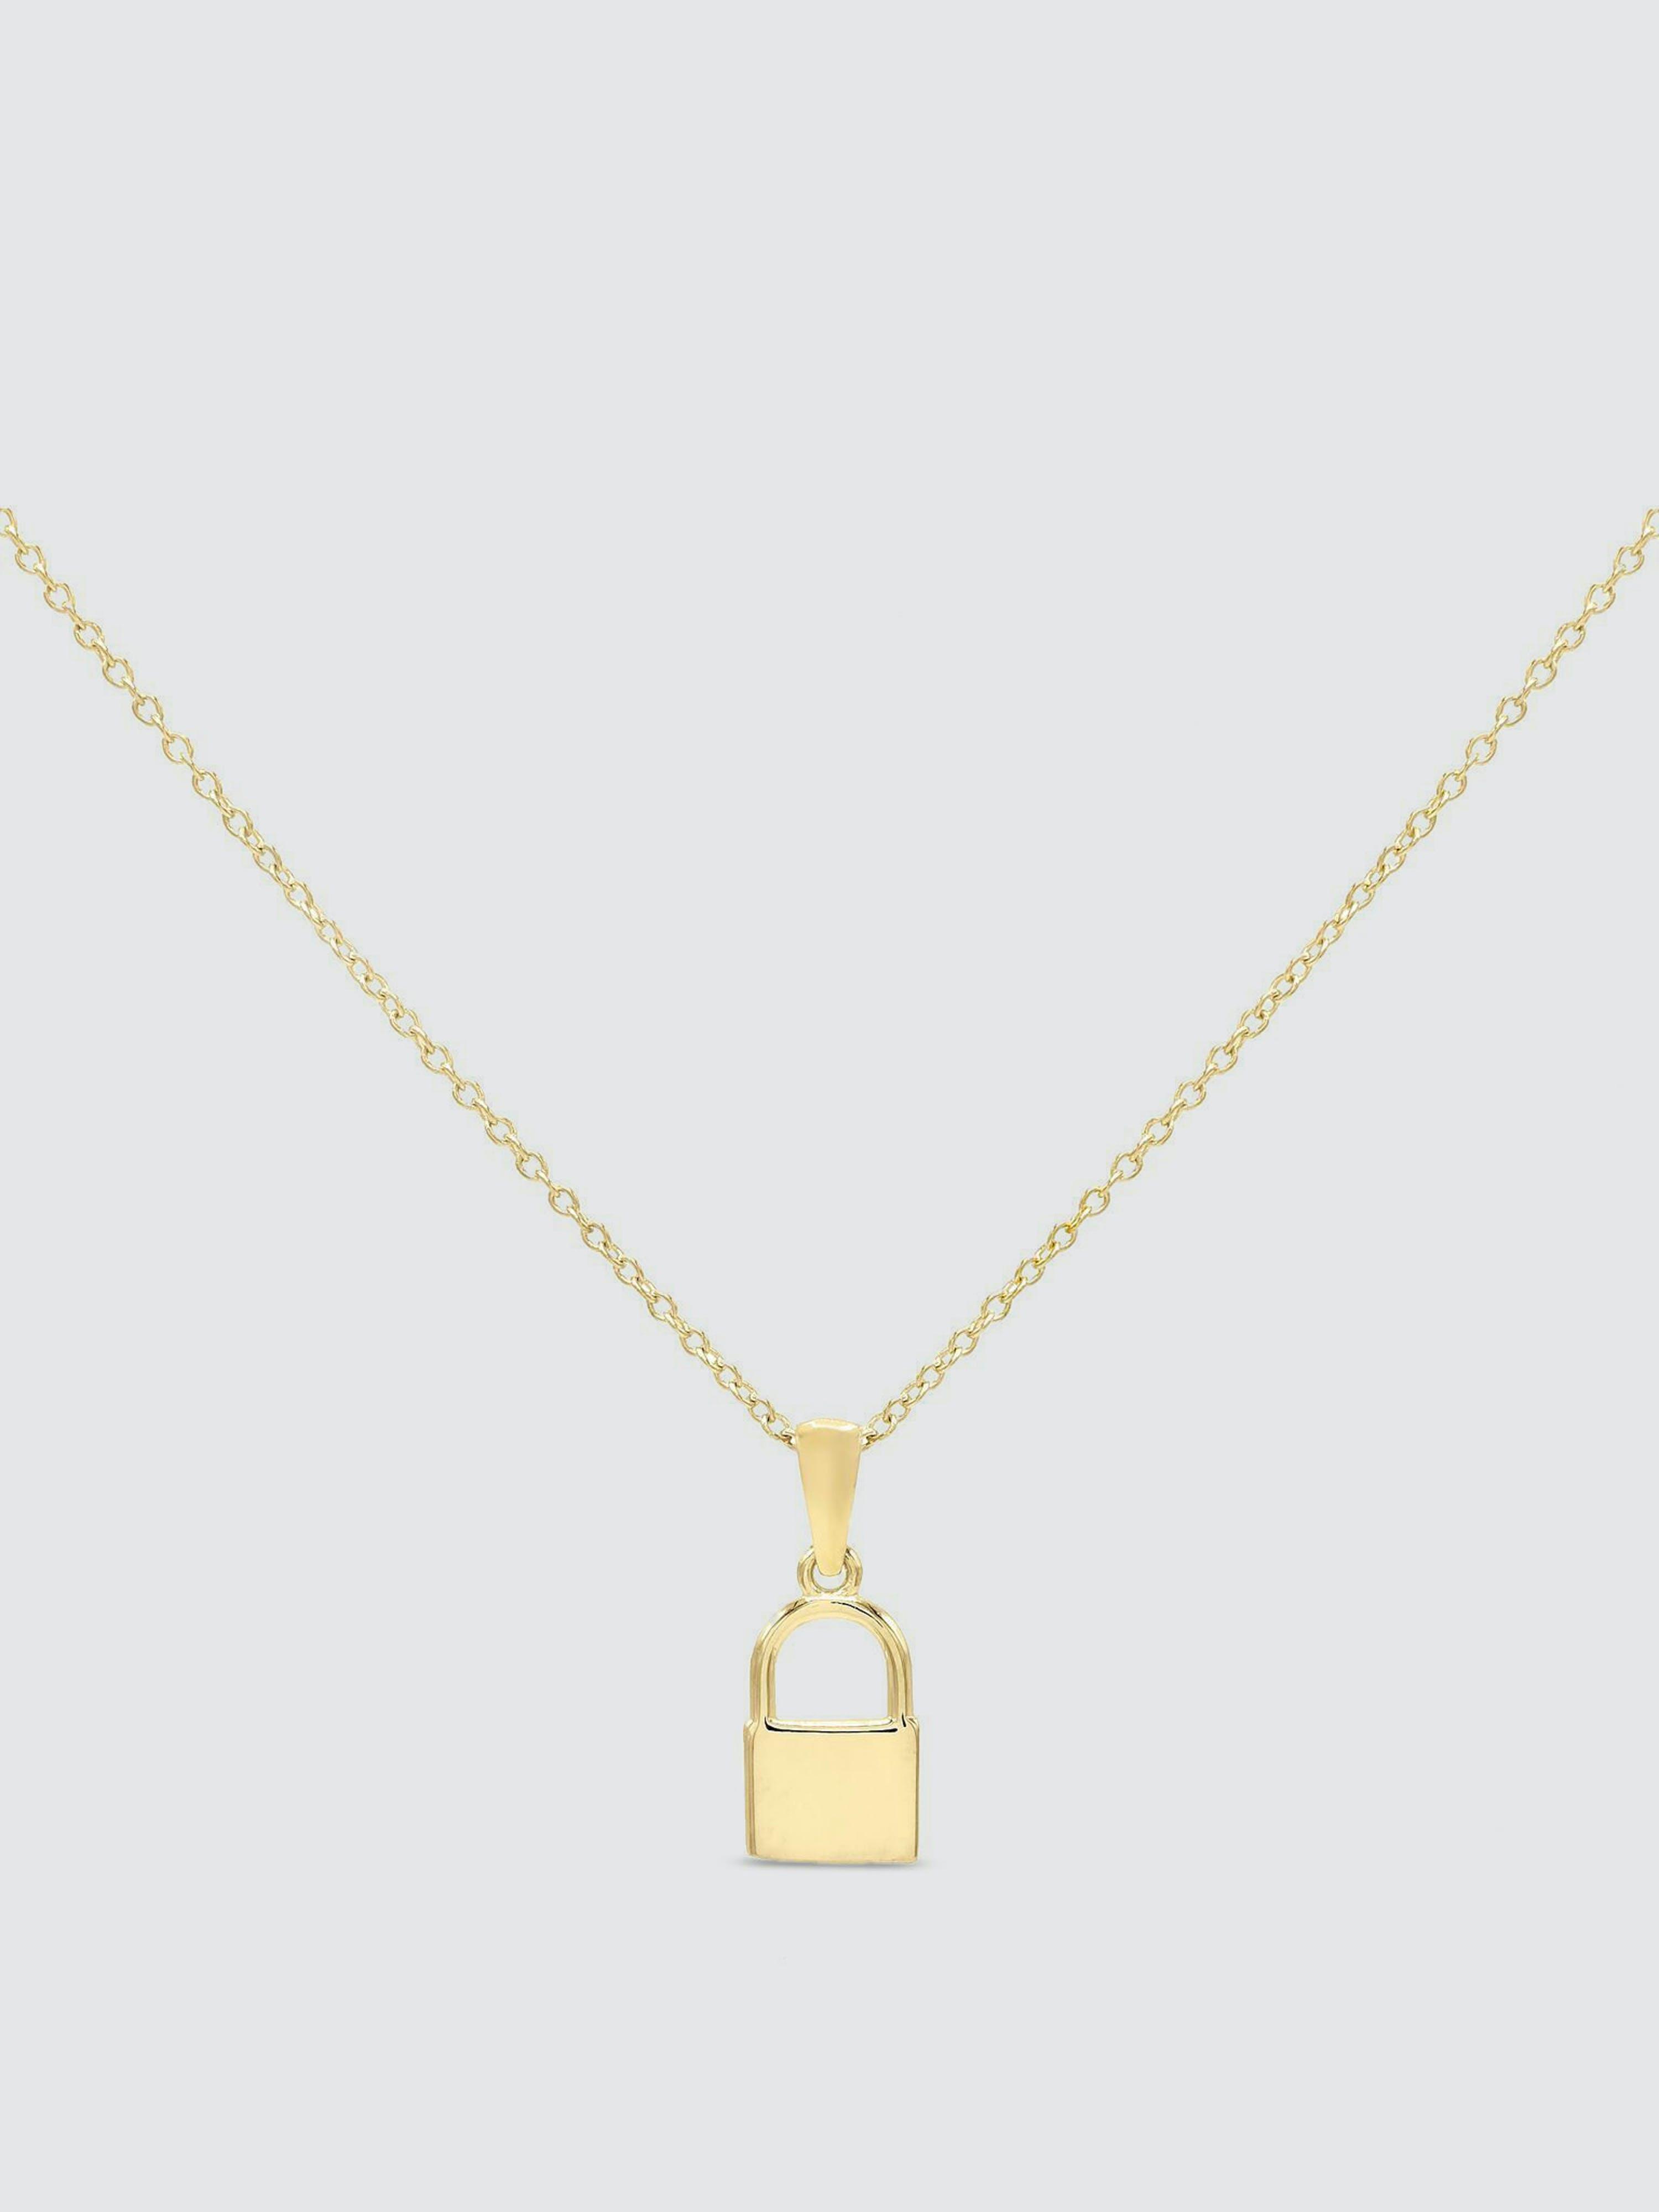 Adinas Jewels Mini Lock Necklace In Gold